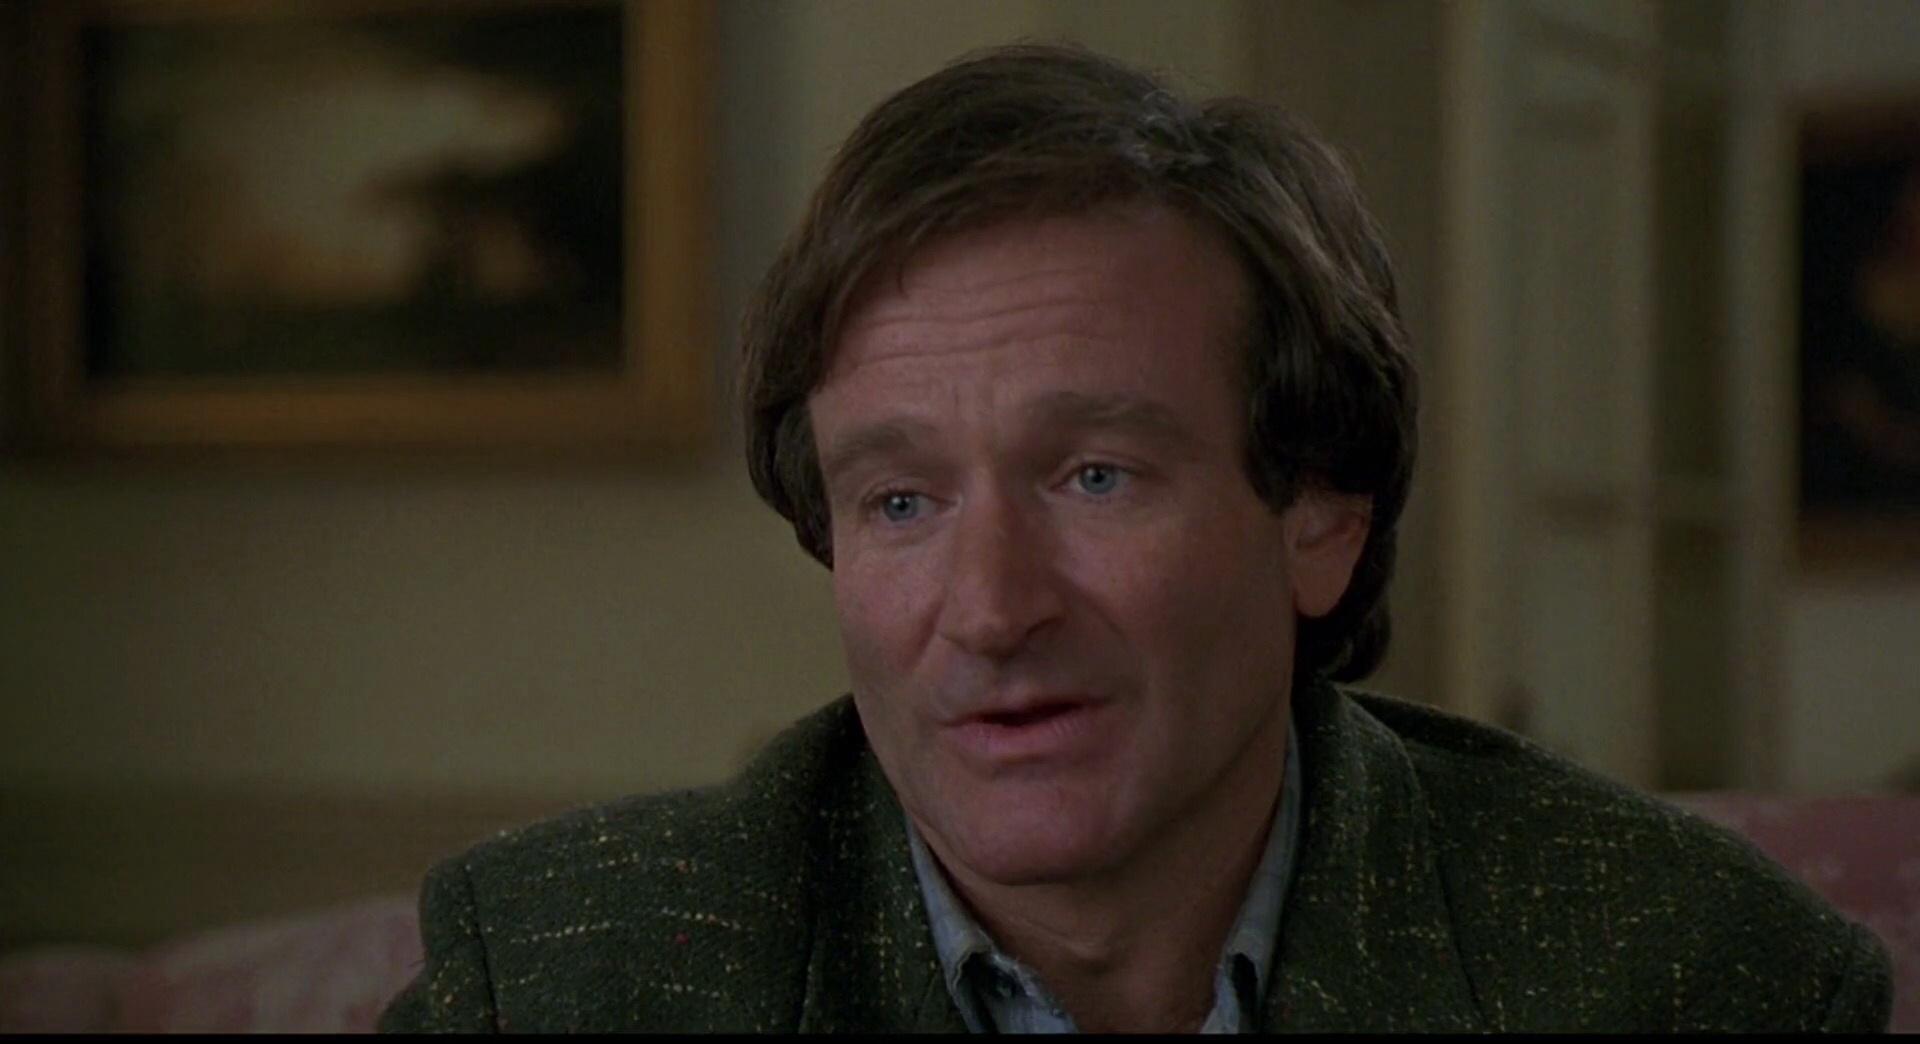 Robin in Jumanji - Robin Williams Fan Art (37487146) - Fanpop